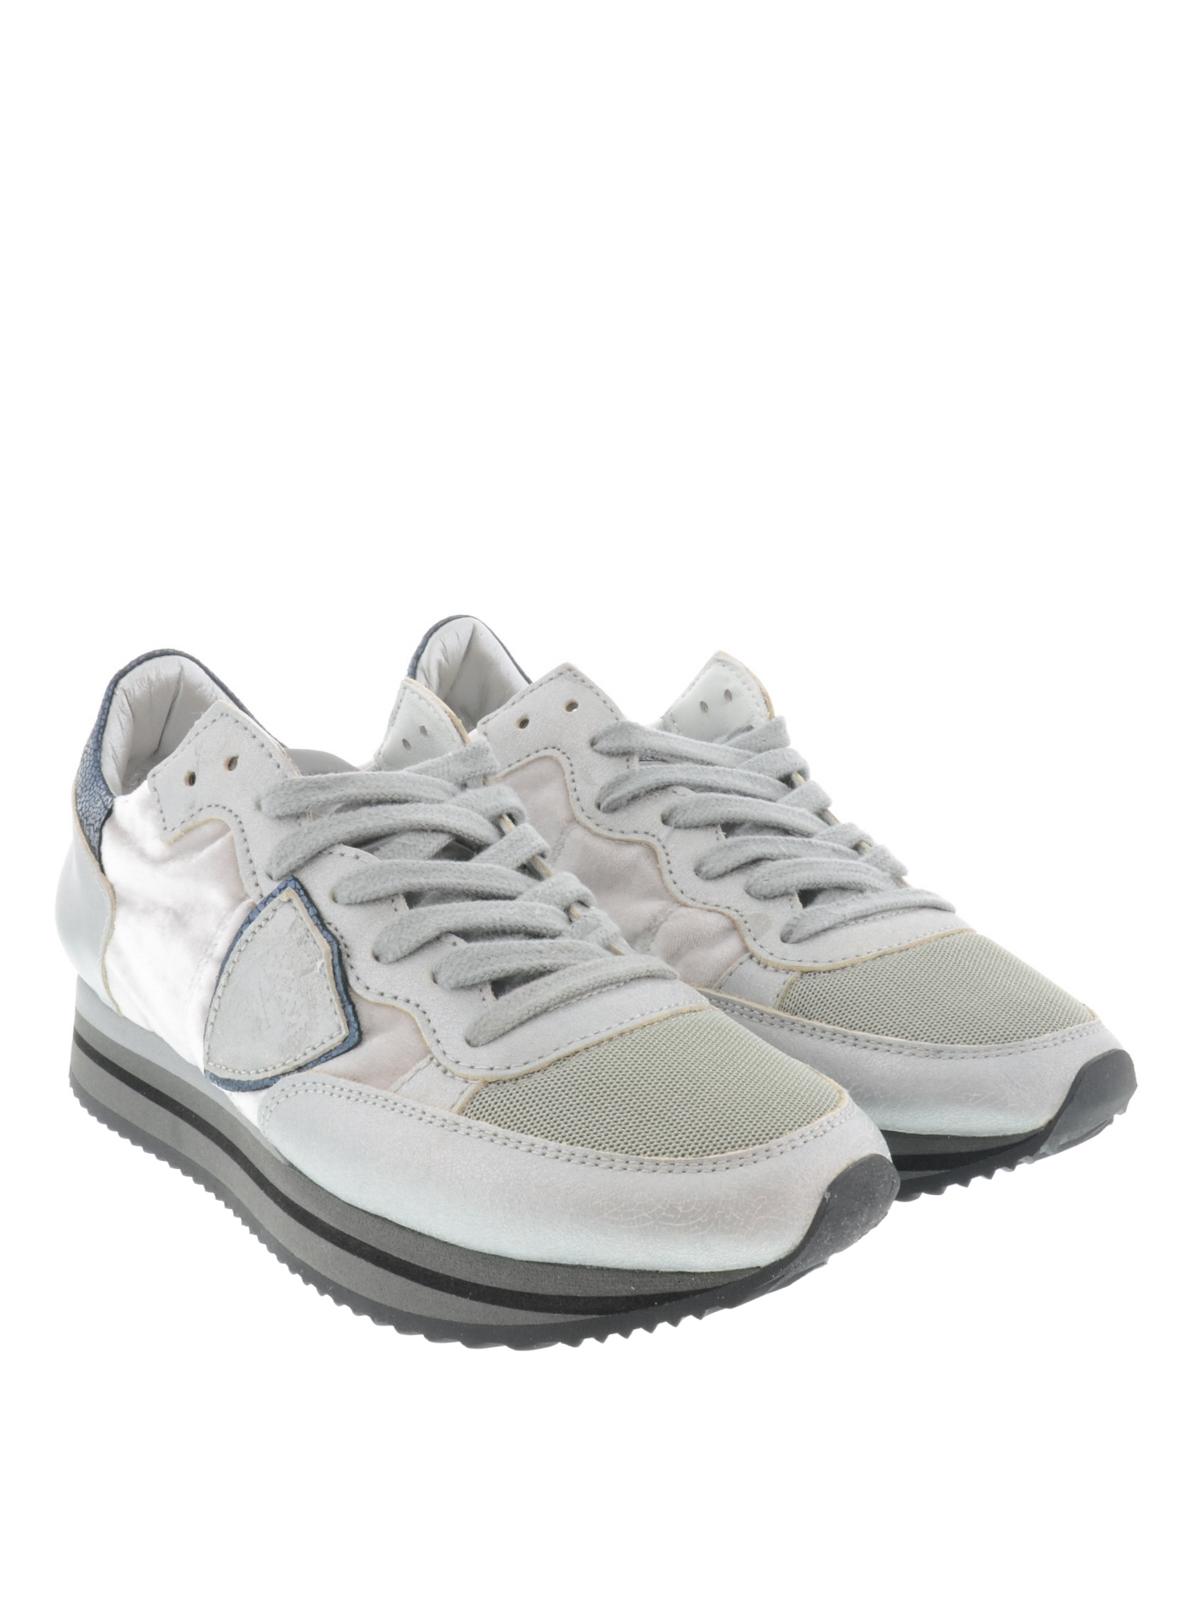 sneaker tropez alte philippe model sneakers ikrix. Black Bedroom Furniture Sets. Home Design Ideas